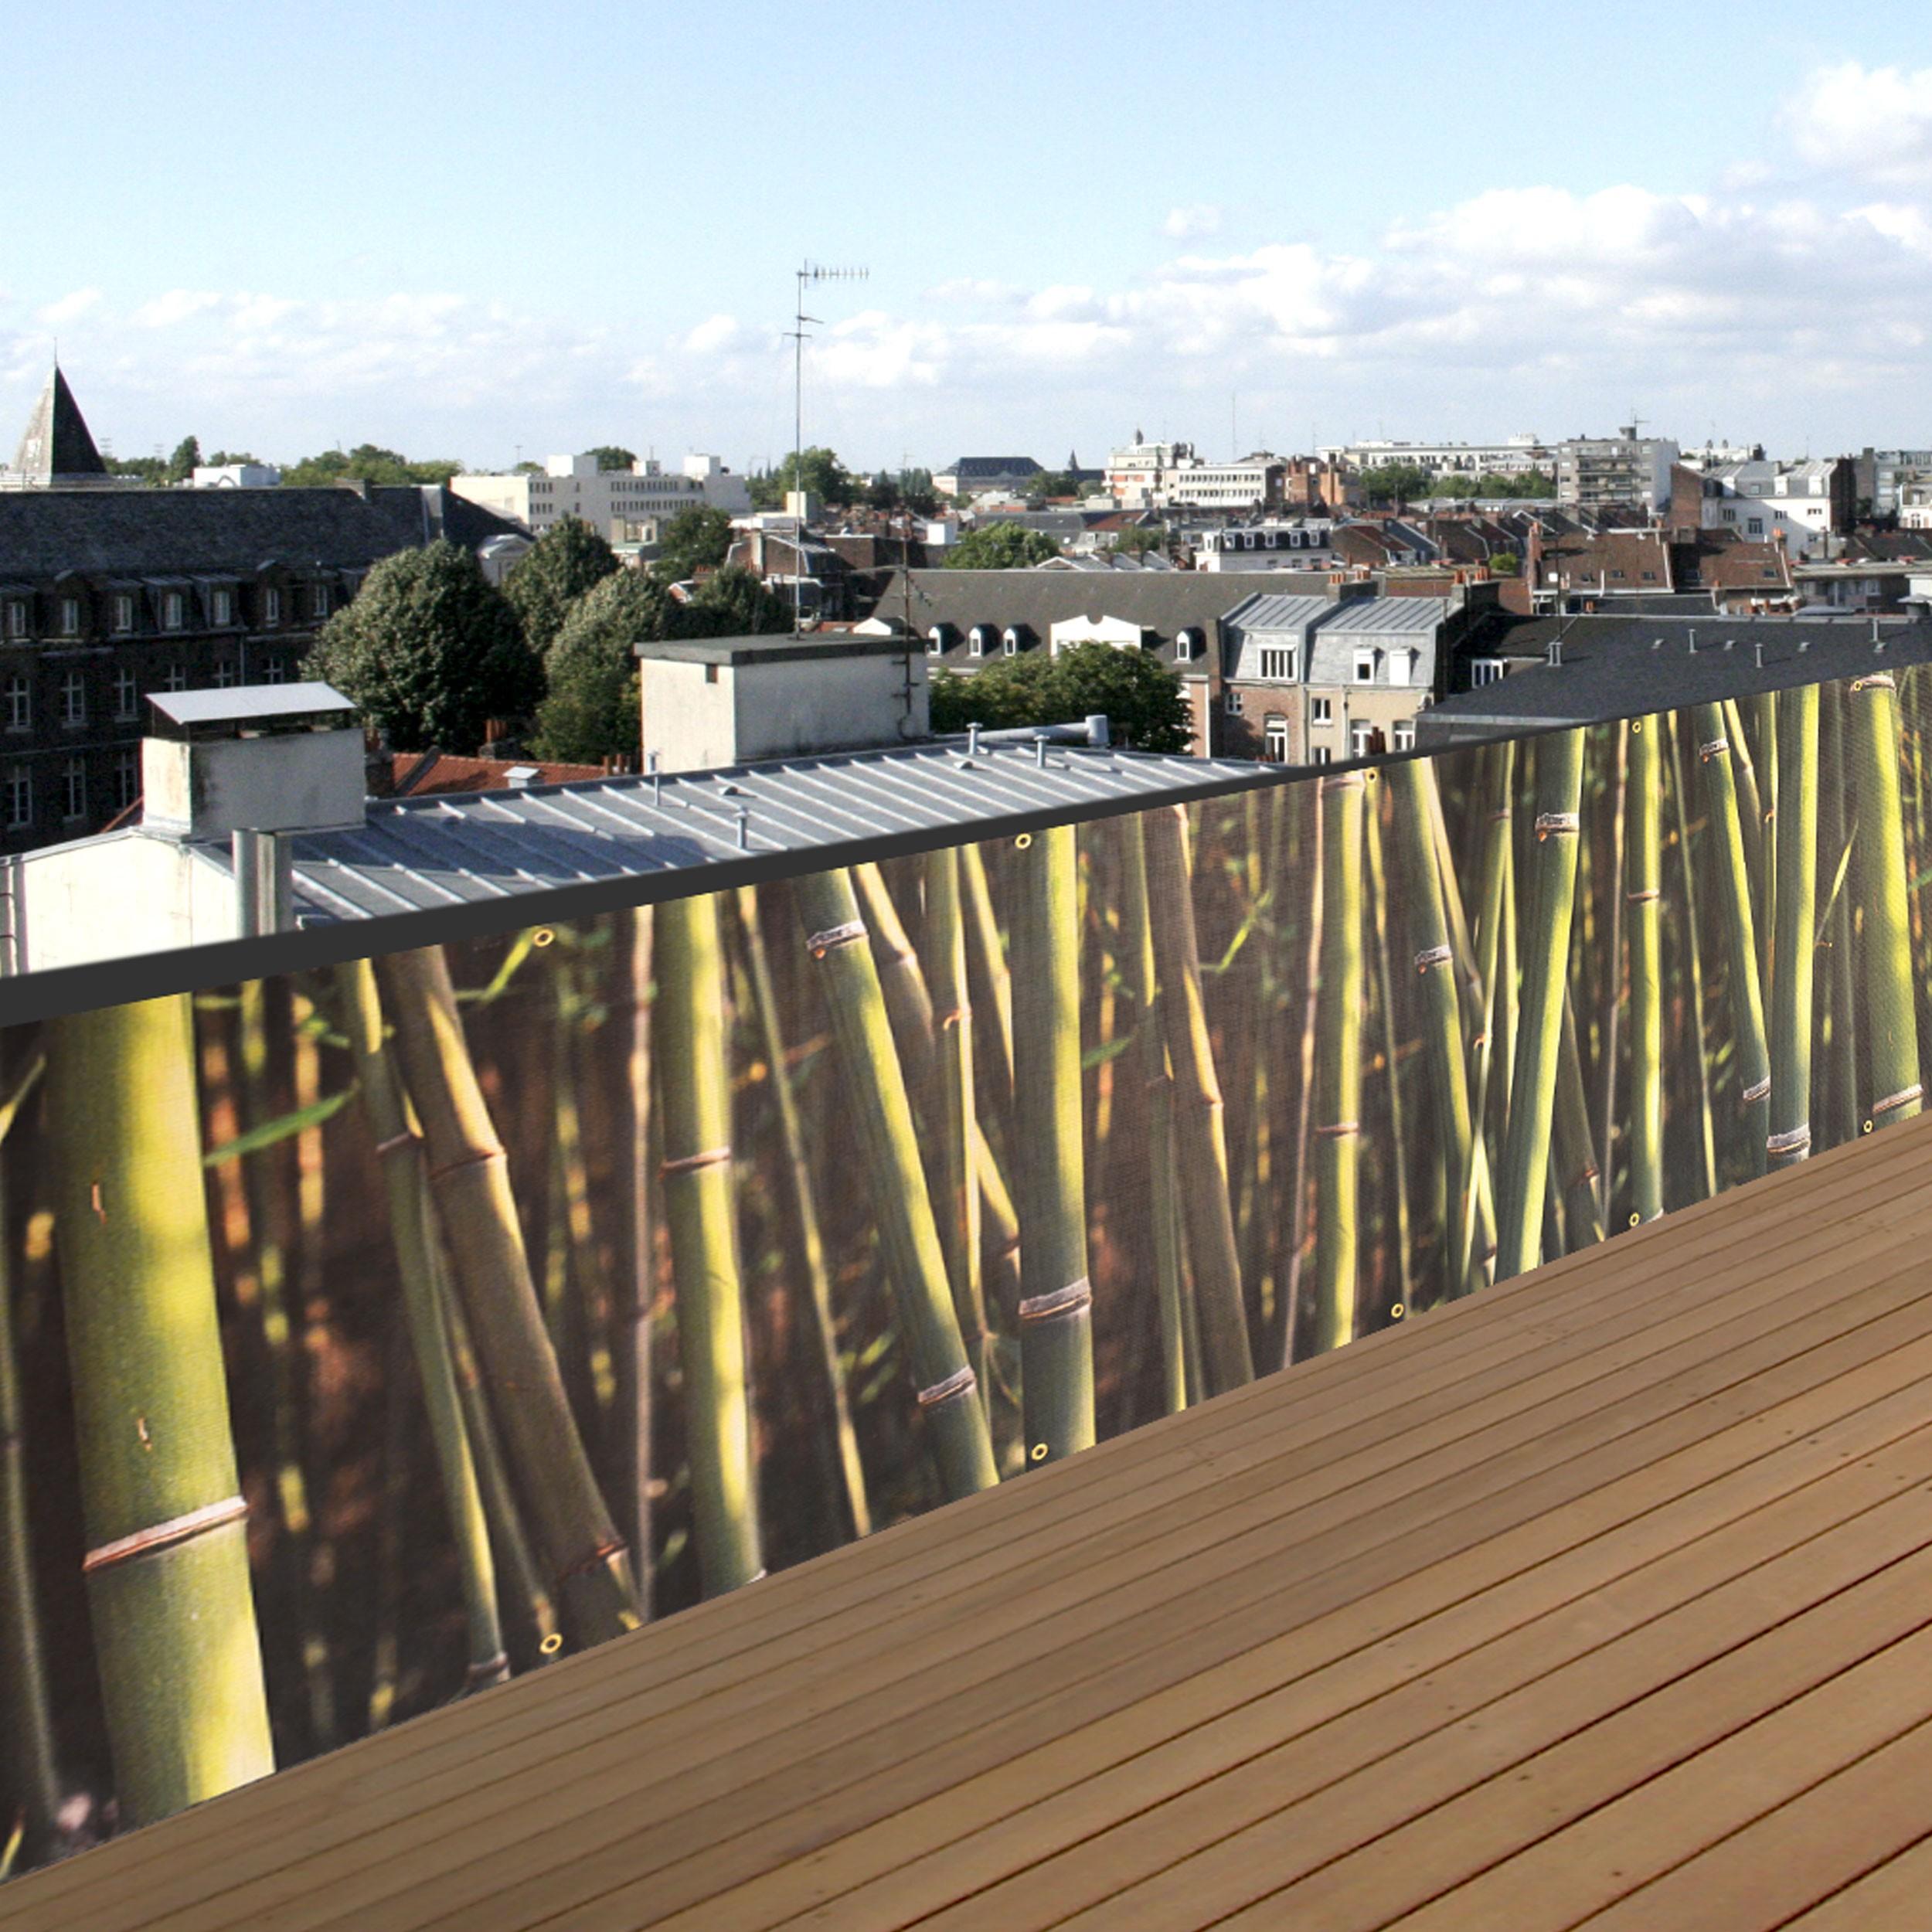 Brise-vue de jardin Bamboo : commandez nos brise-vue de jardin ...